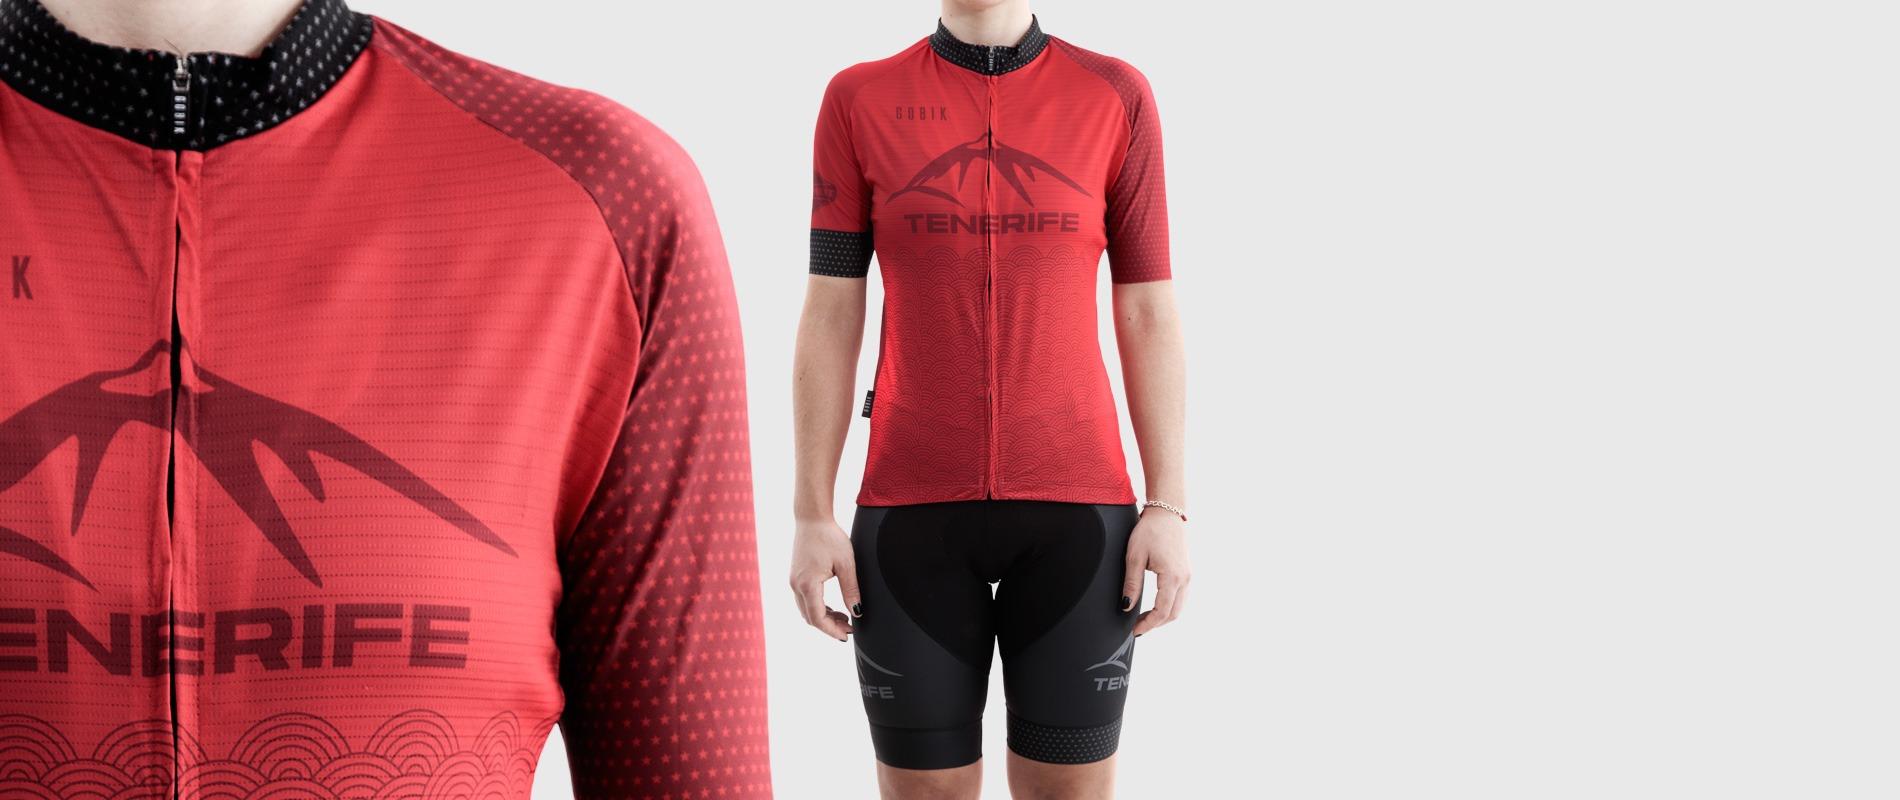 Gobik Female Red Jersey Splash Bike Point Tenerife Bike Hire & Bike Rental